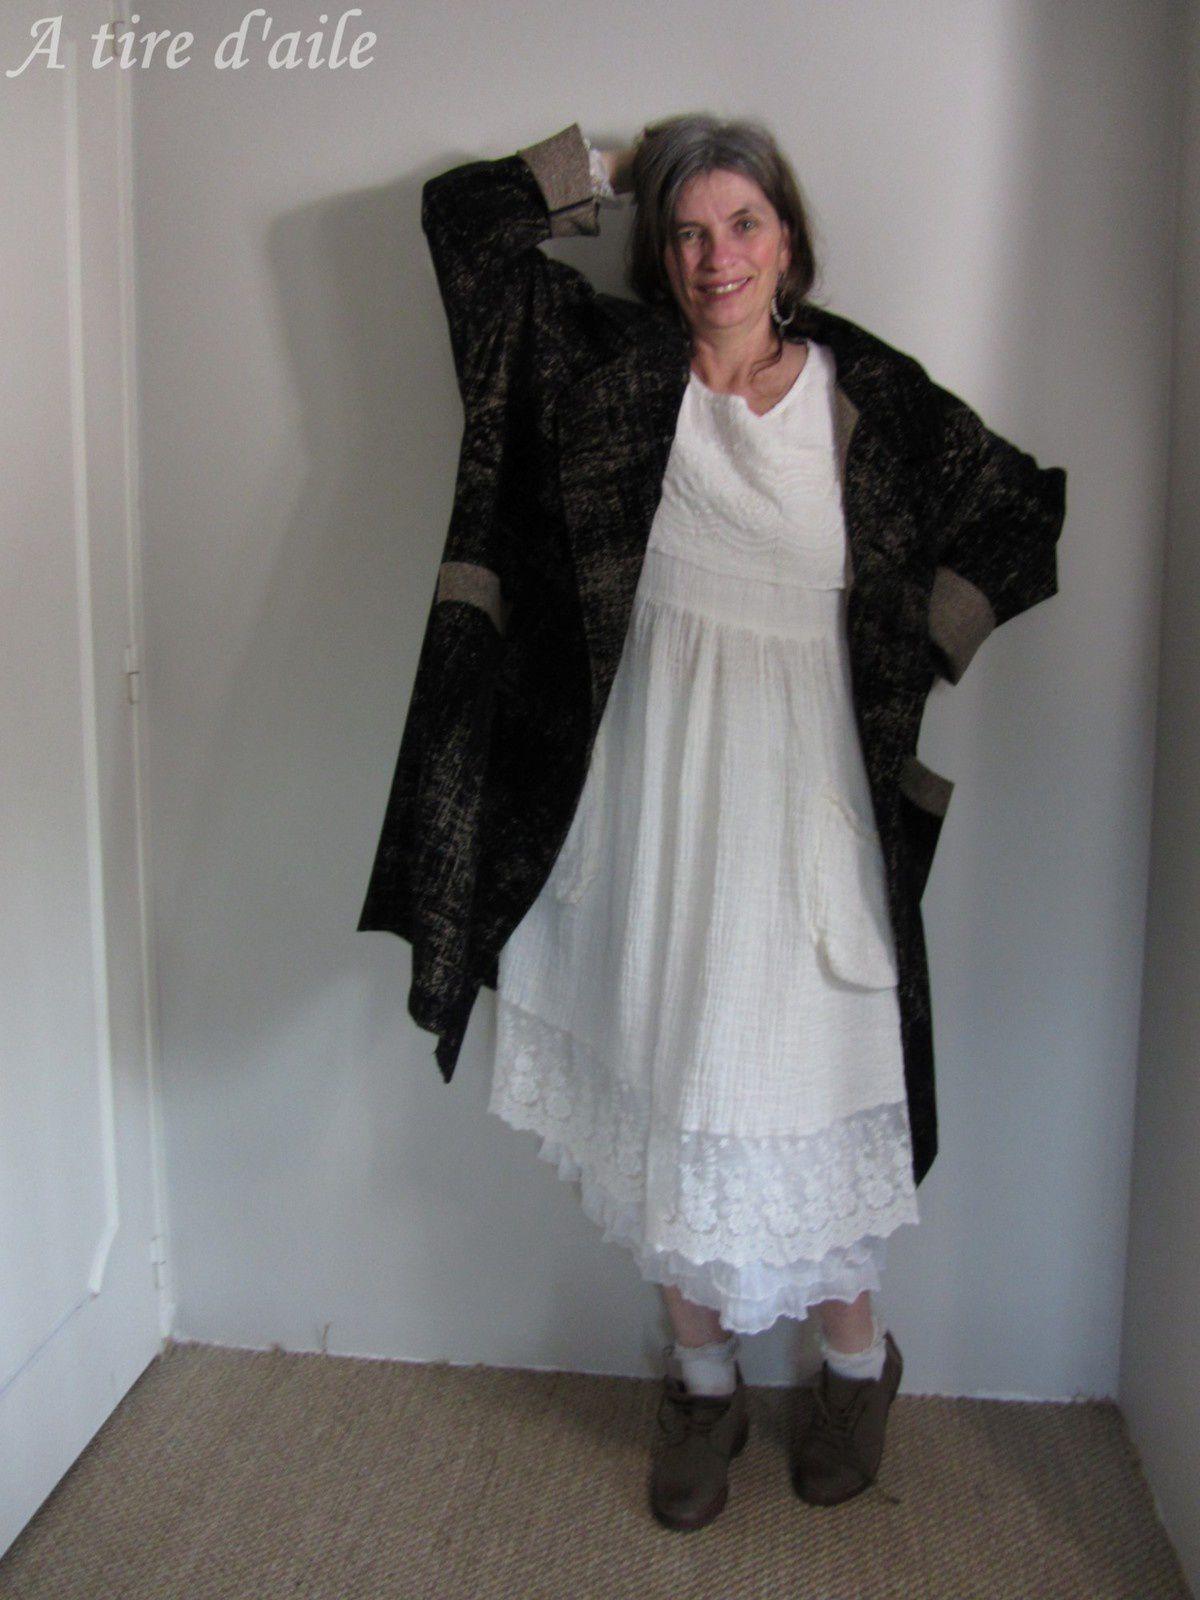 Manteau en velours, robe en lin, robe camouflage, pantalon en tweed, robe chasuble en lin...Tout un défilé !!